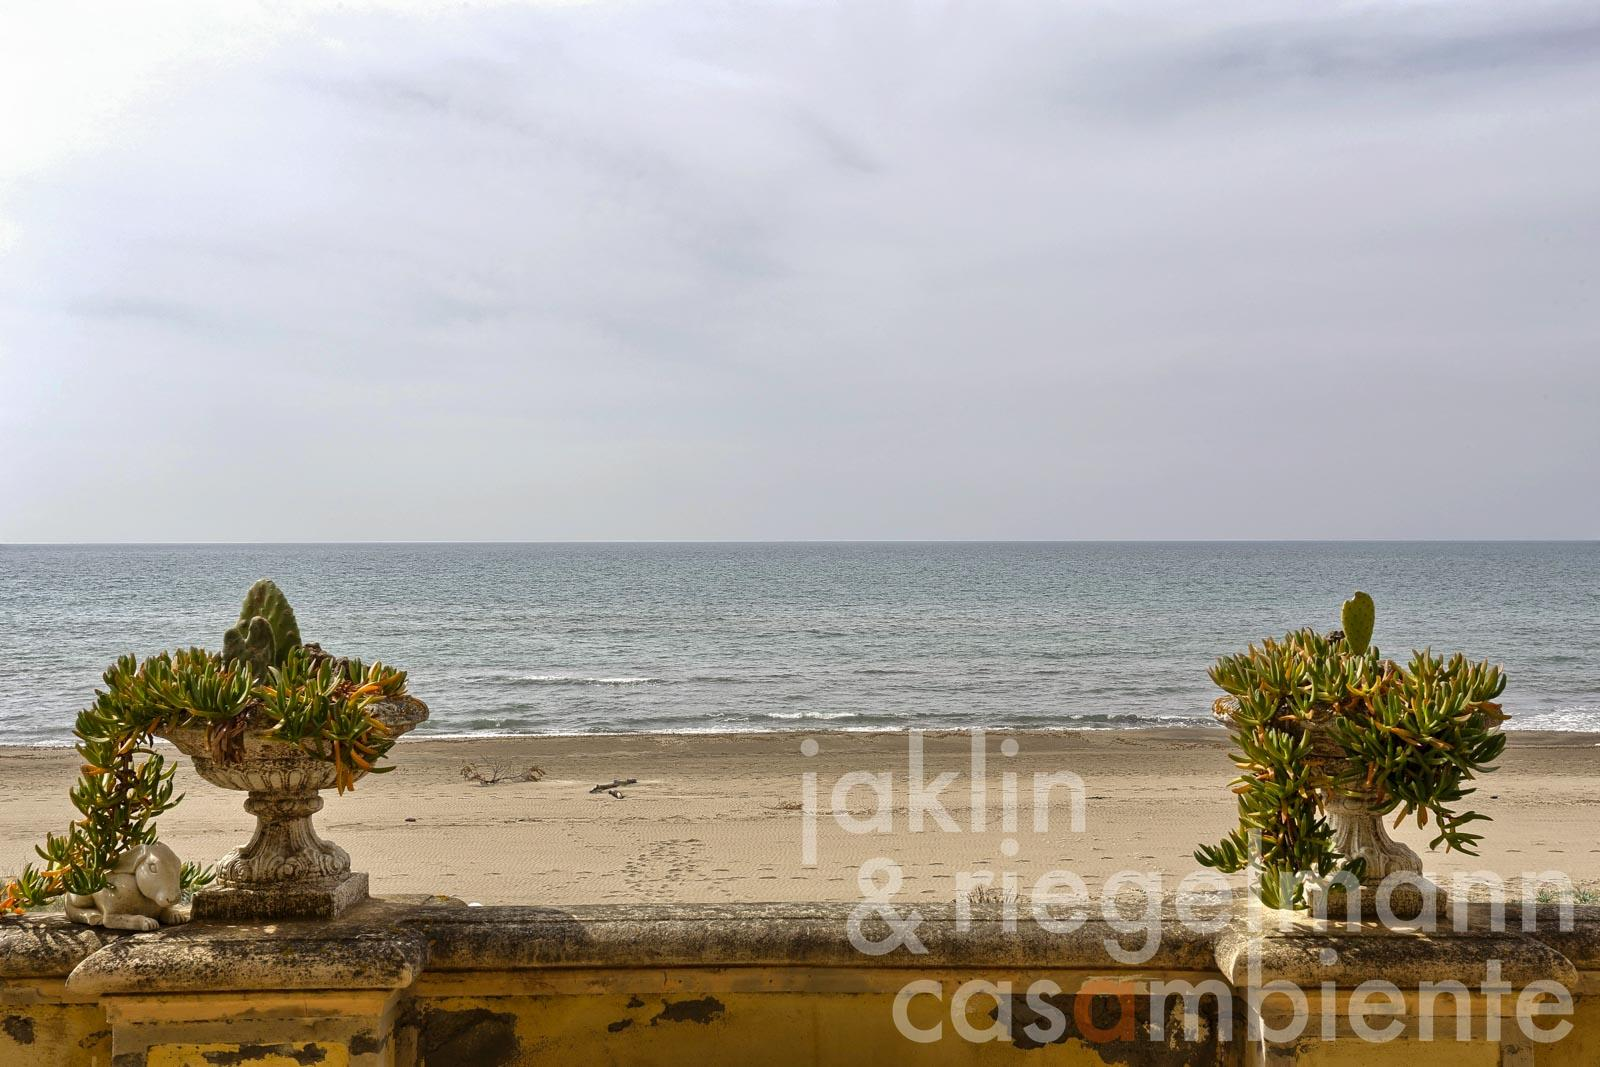 Italien, Toskana, Marina di Castagneto Carducci, Apartement direkt am Meer